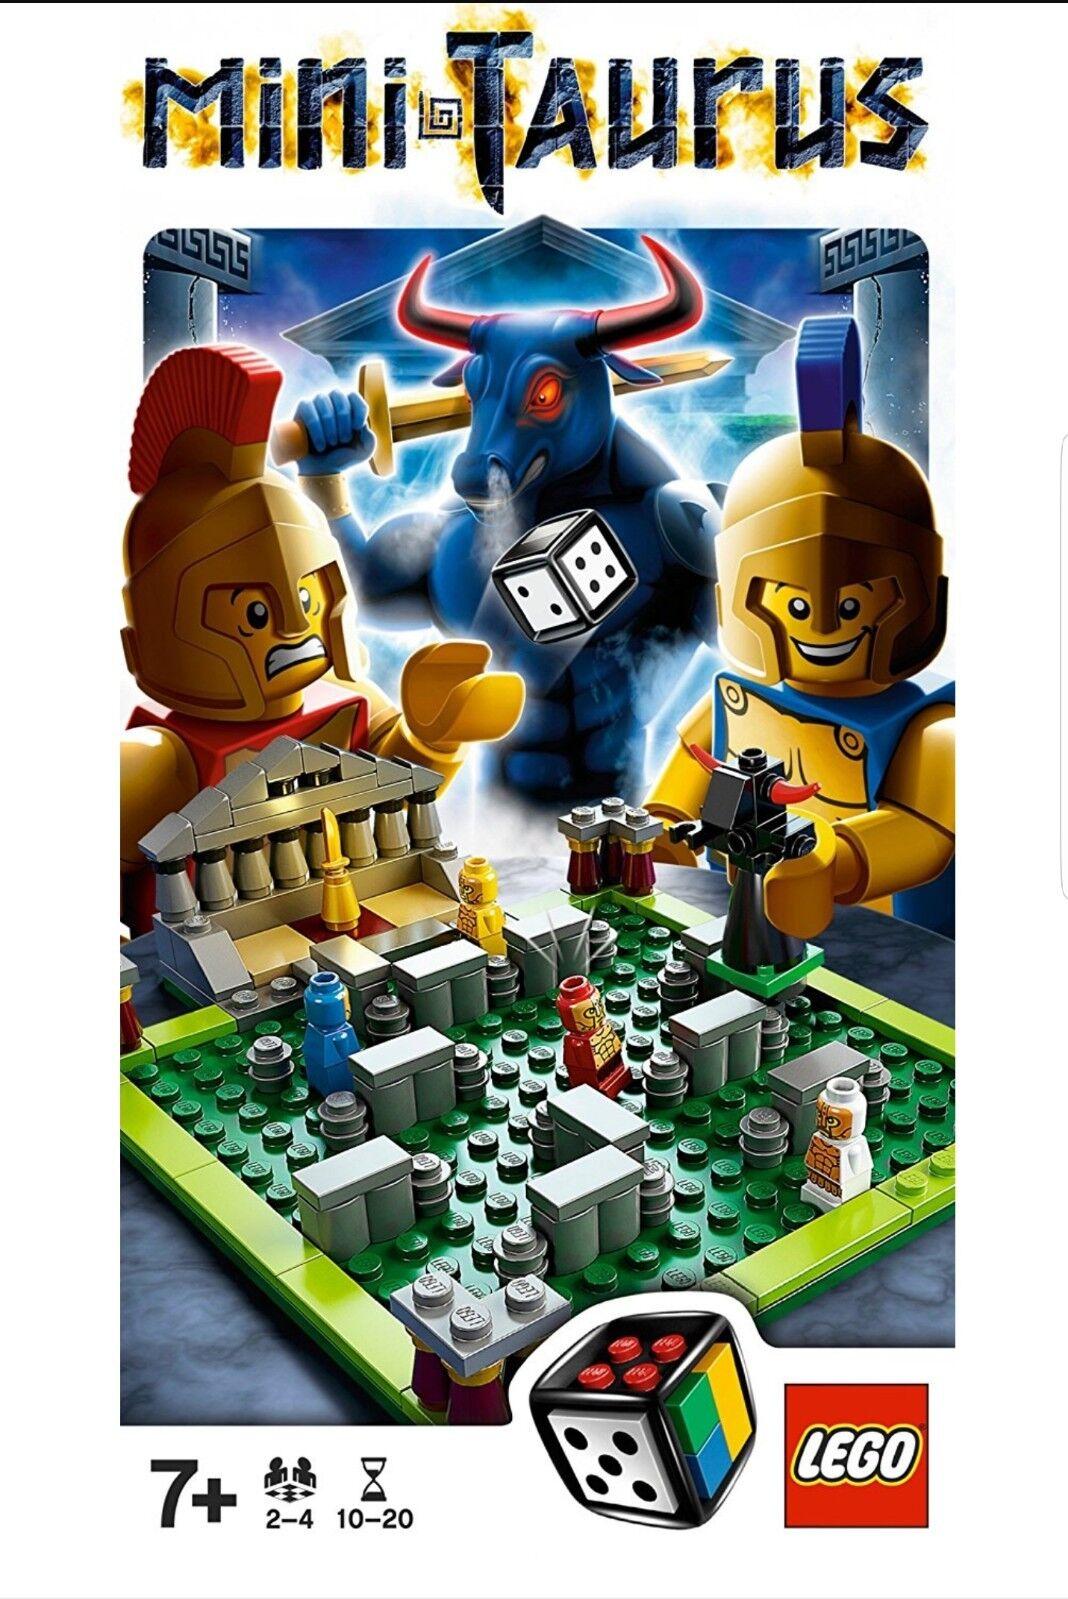 LEGO Games 3864  Mini Taurus BRAND NEW SHRINK WRAPPED